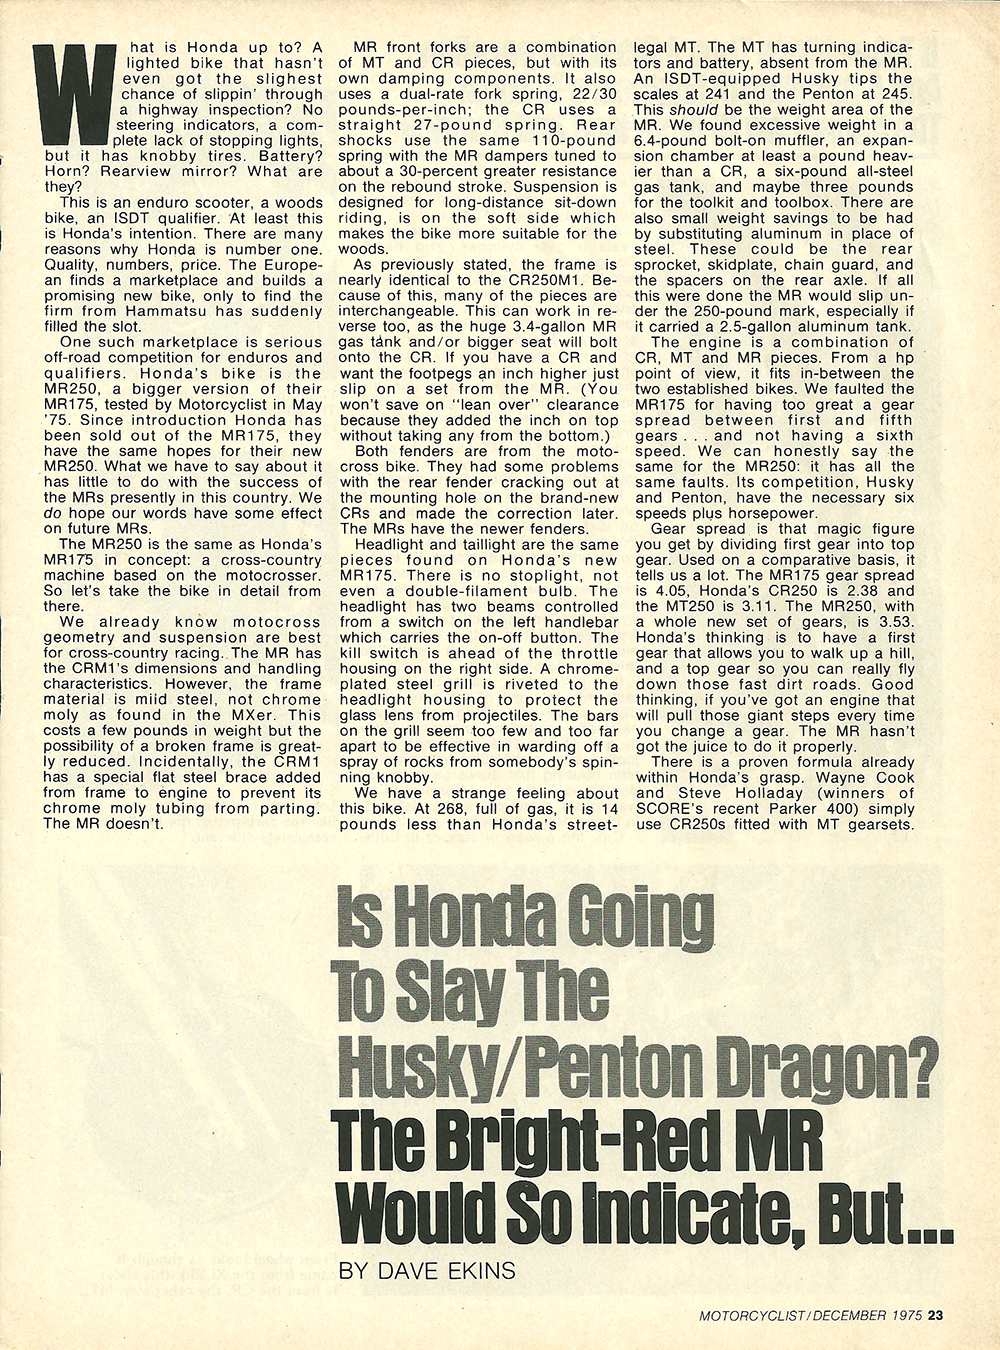 1975 Honda MR 250 road test 2.jpg